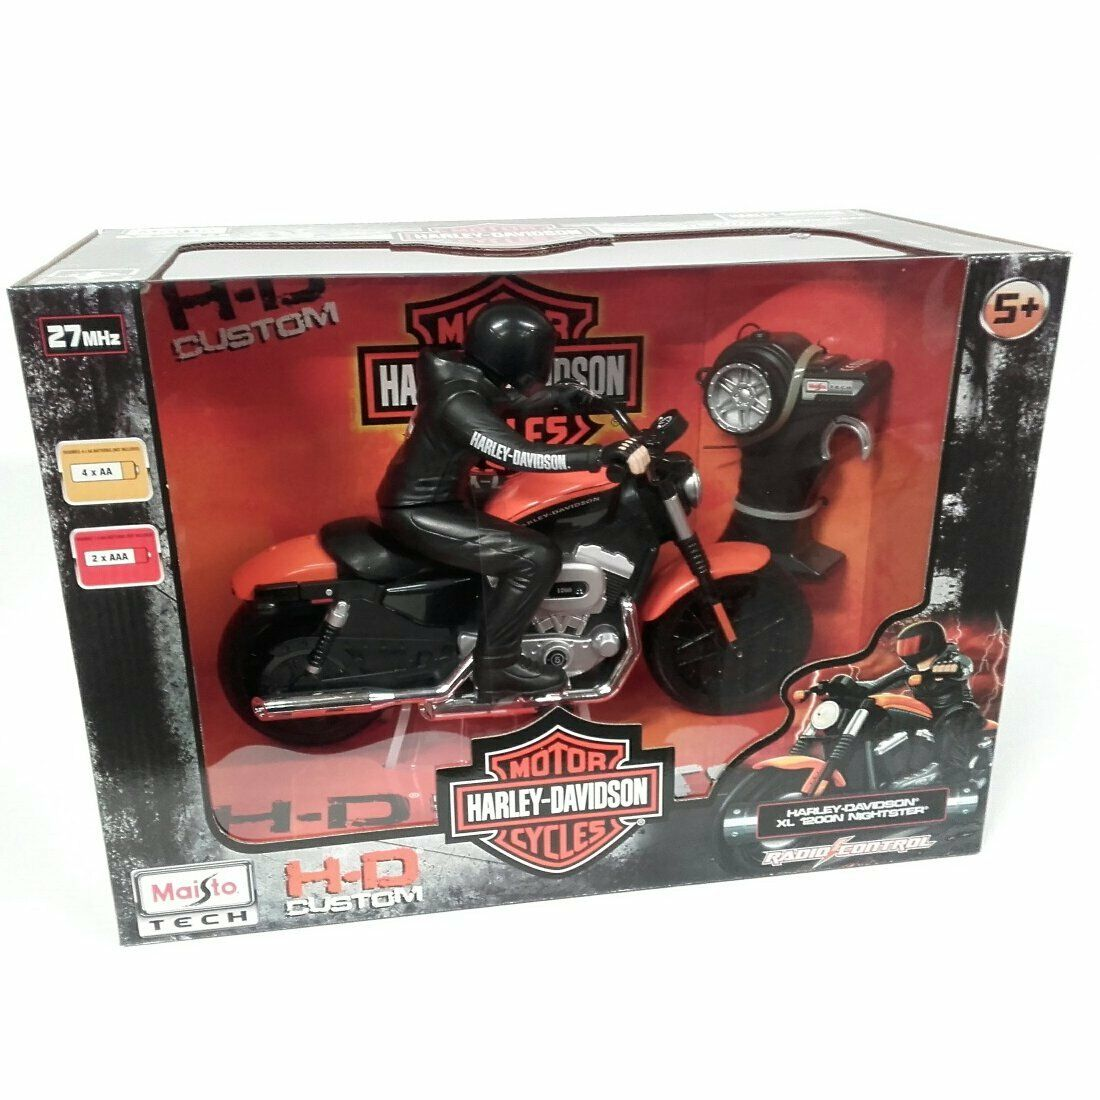 Radio Controlled Harley Davidson Motorcycle orange RC Birthday Gift Toy Car